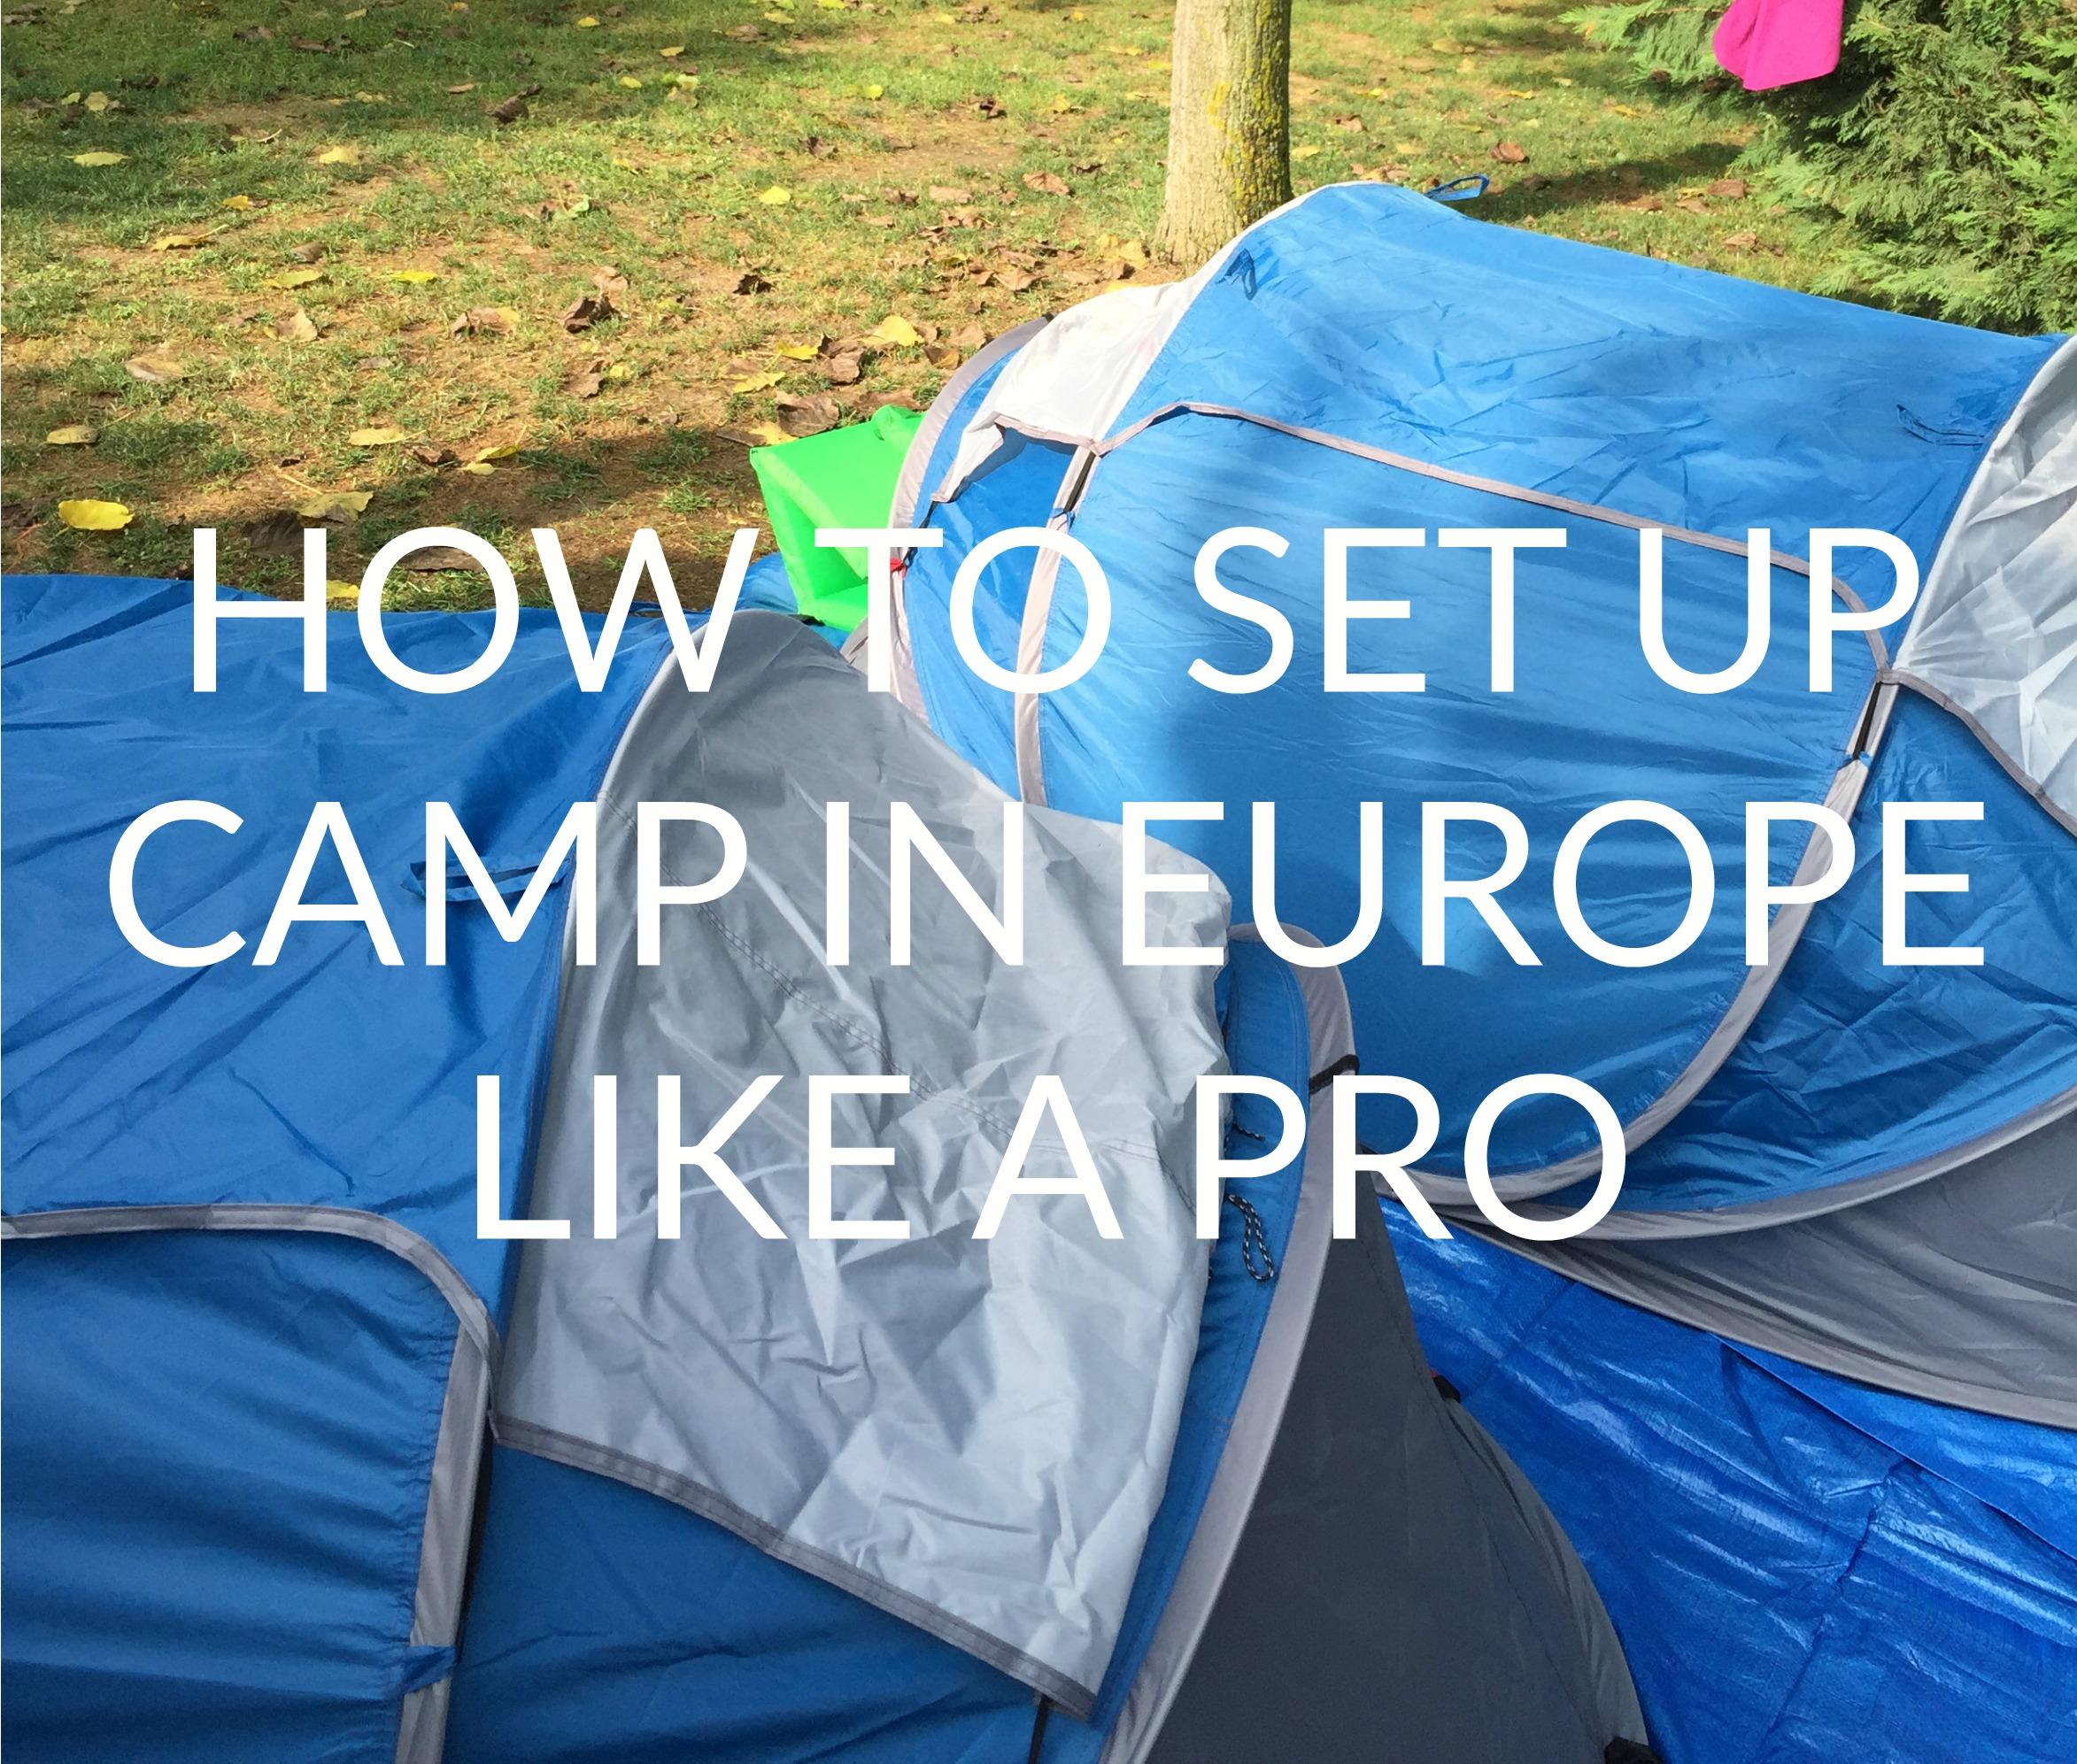 Camp in Europe